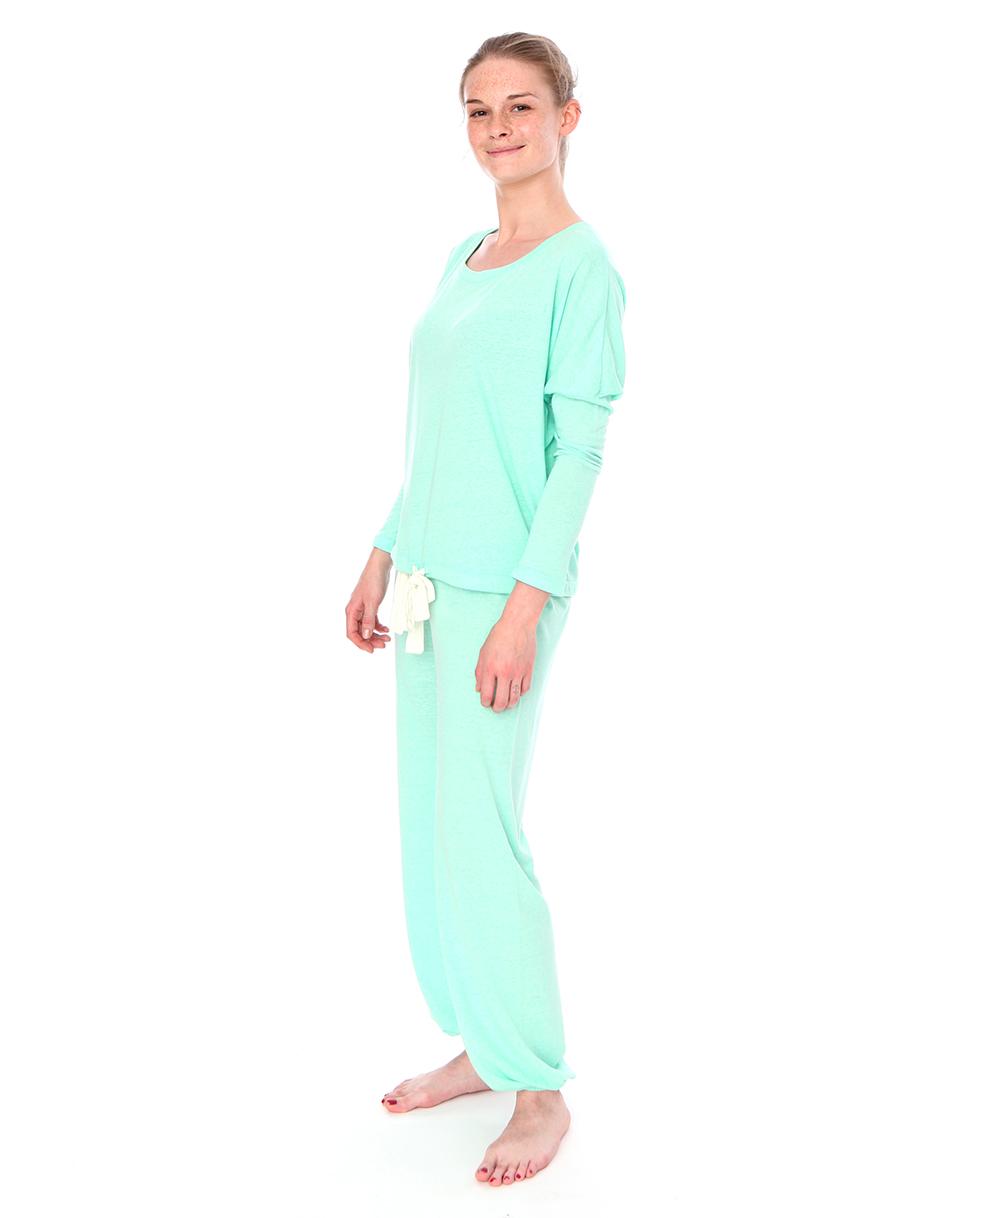 29a7c70146 Zimmerli - The Pyjama Store